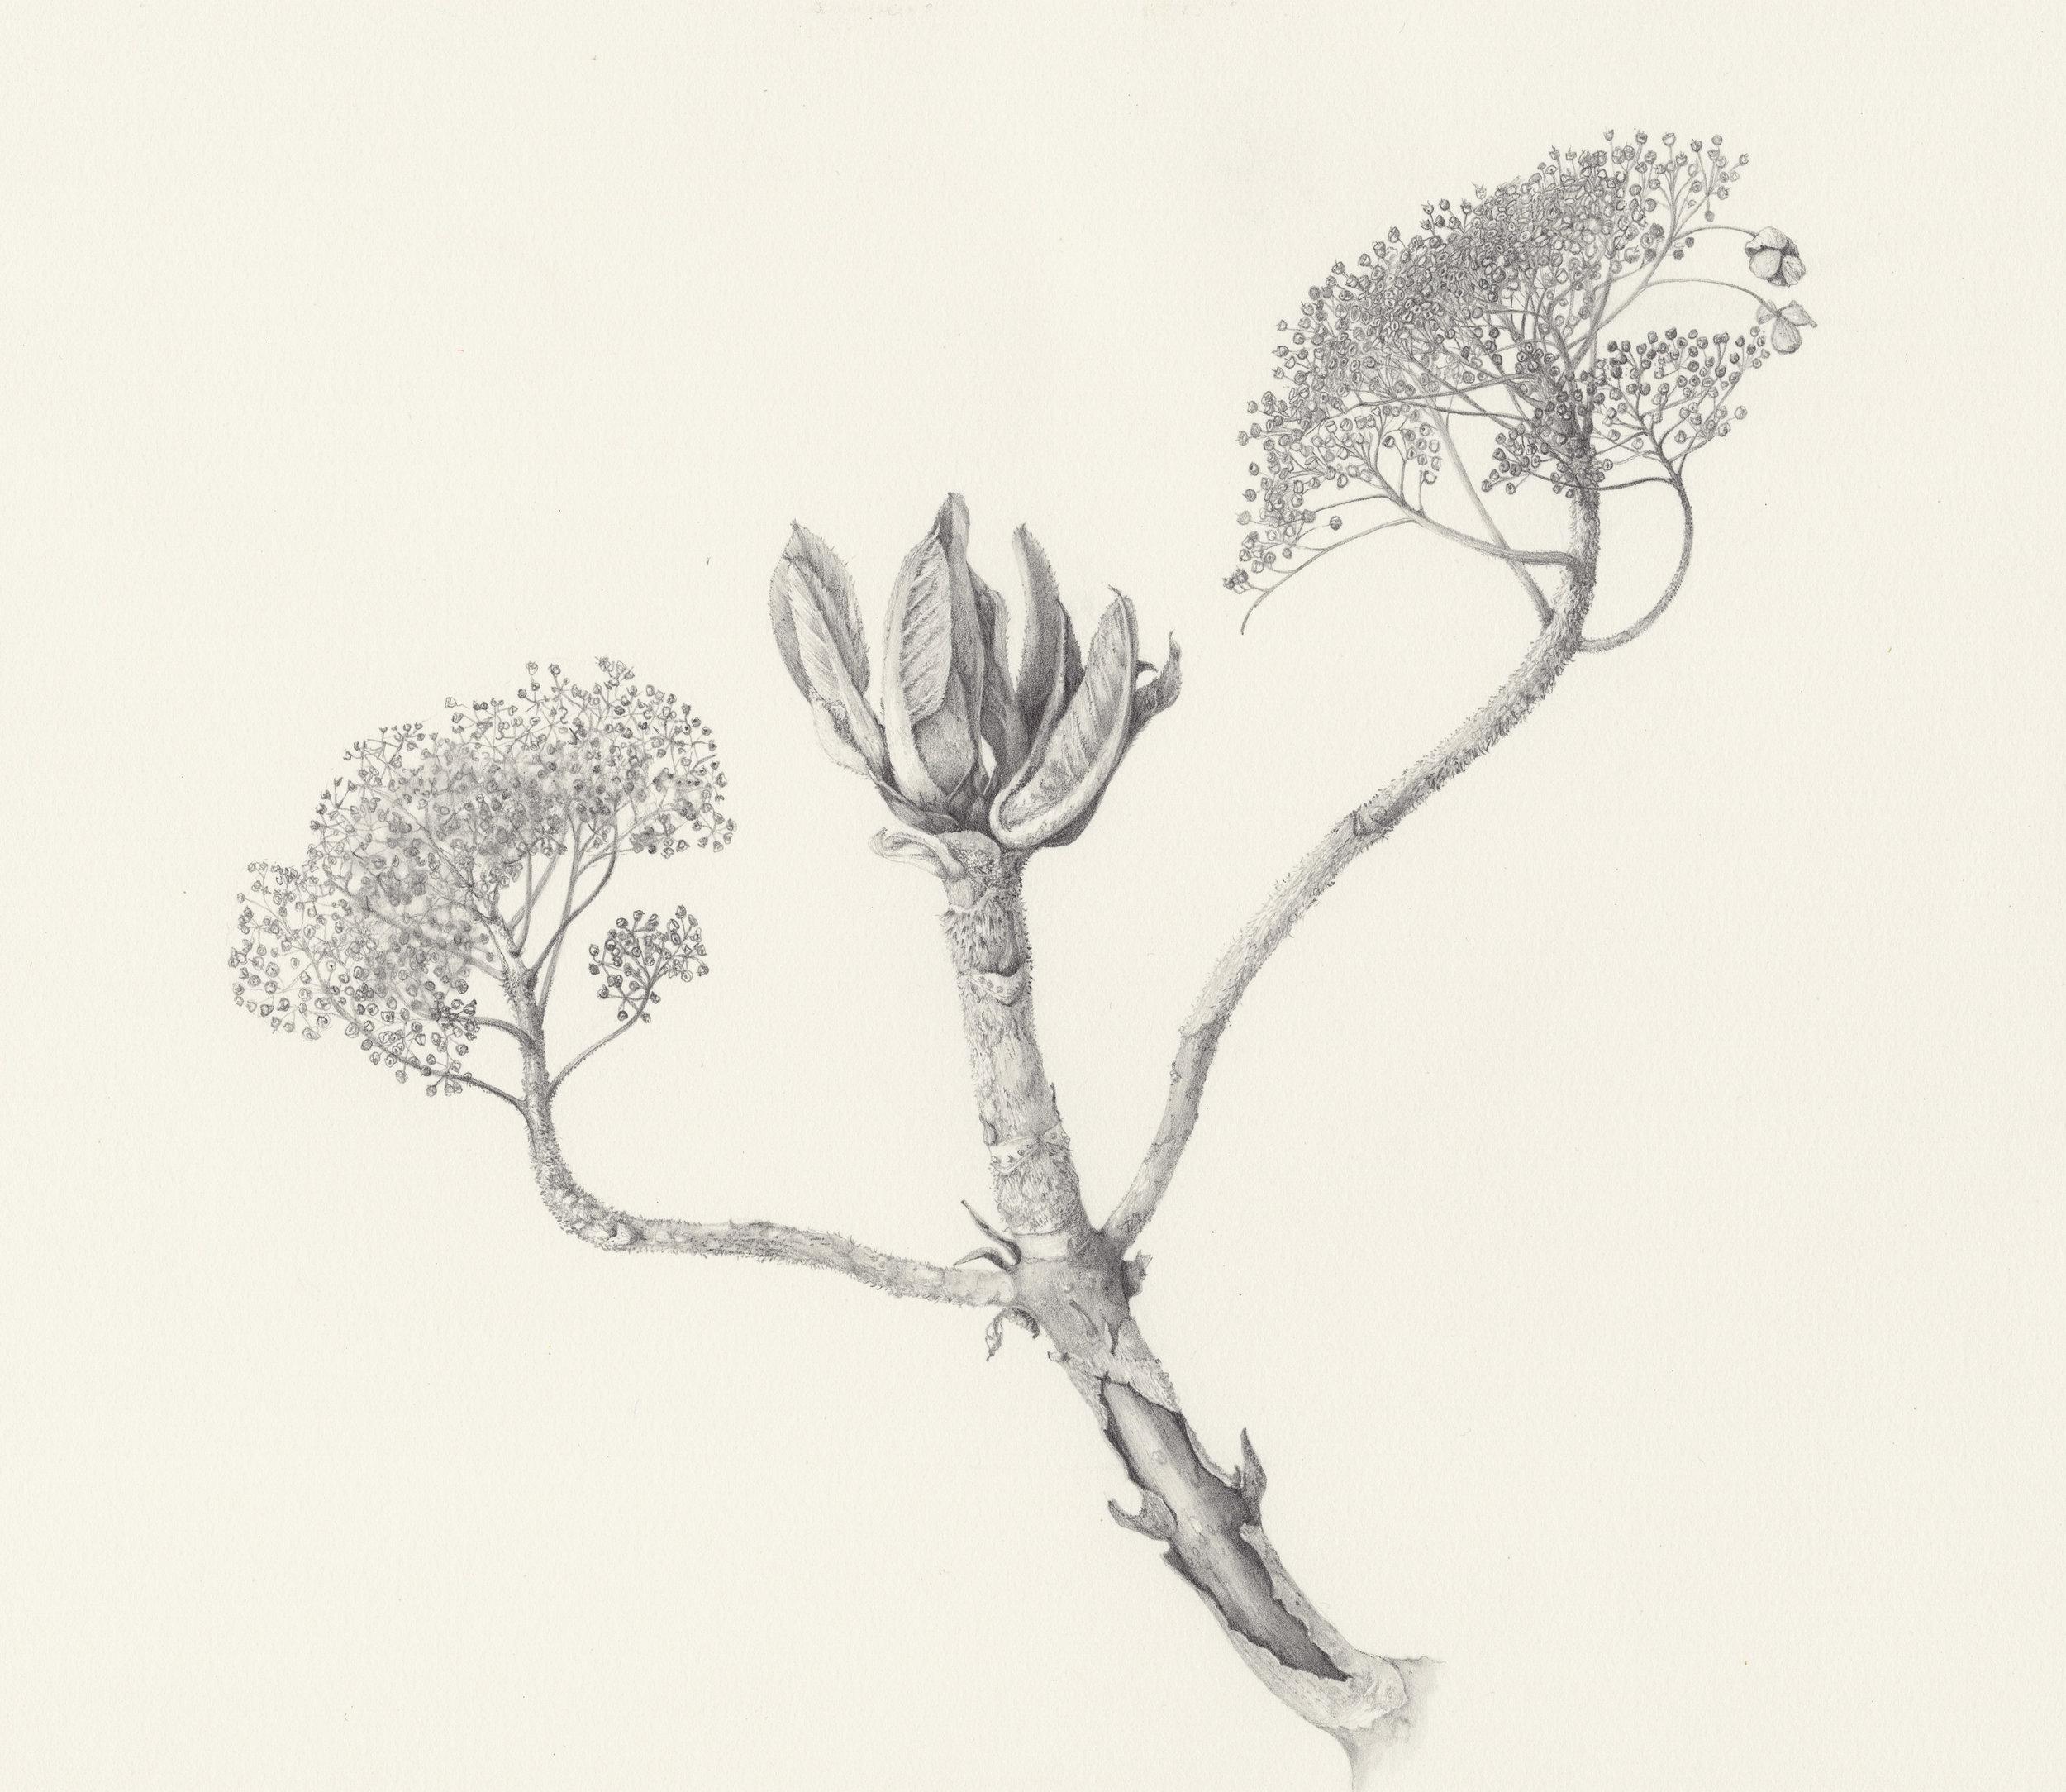 Hydrangea from Preston Hall  graphite on paper  28 x 25 cm image  51 x 48 cm framed  £560